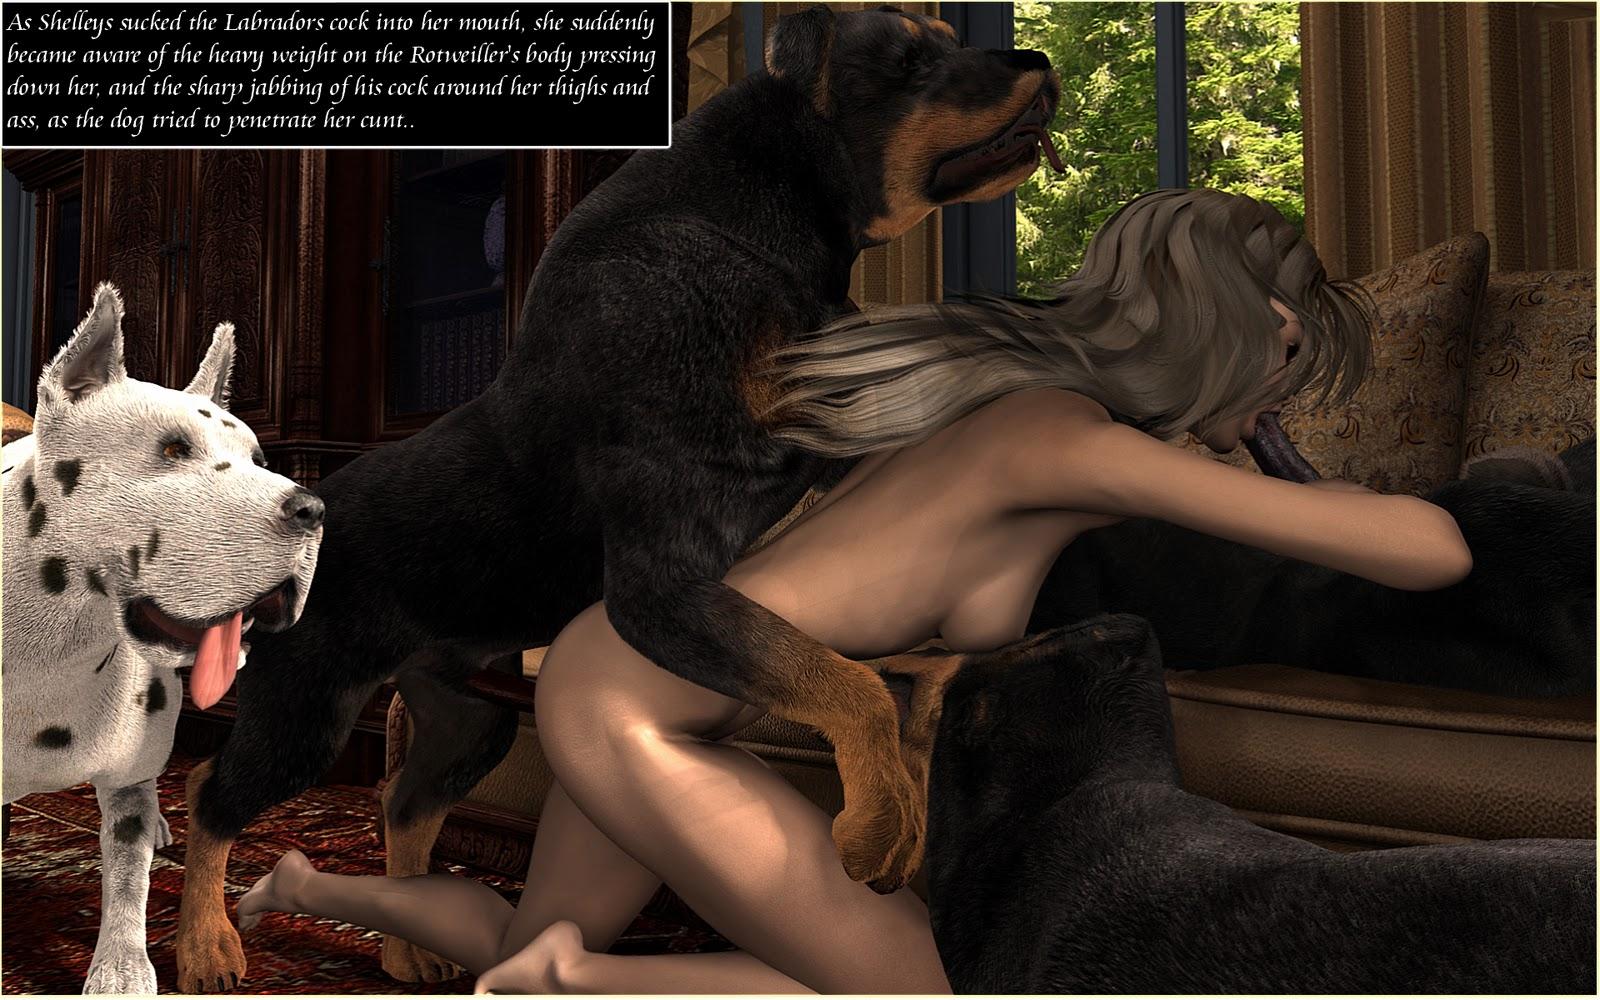 Elf sex slave episode 2 sex galleries